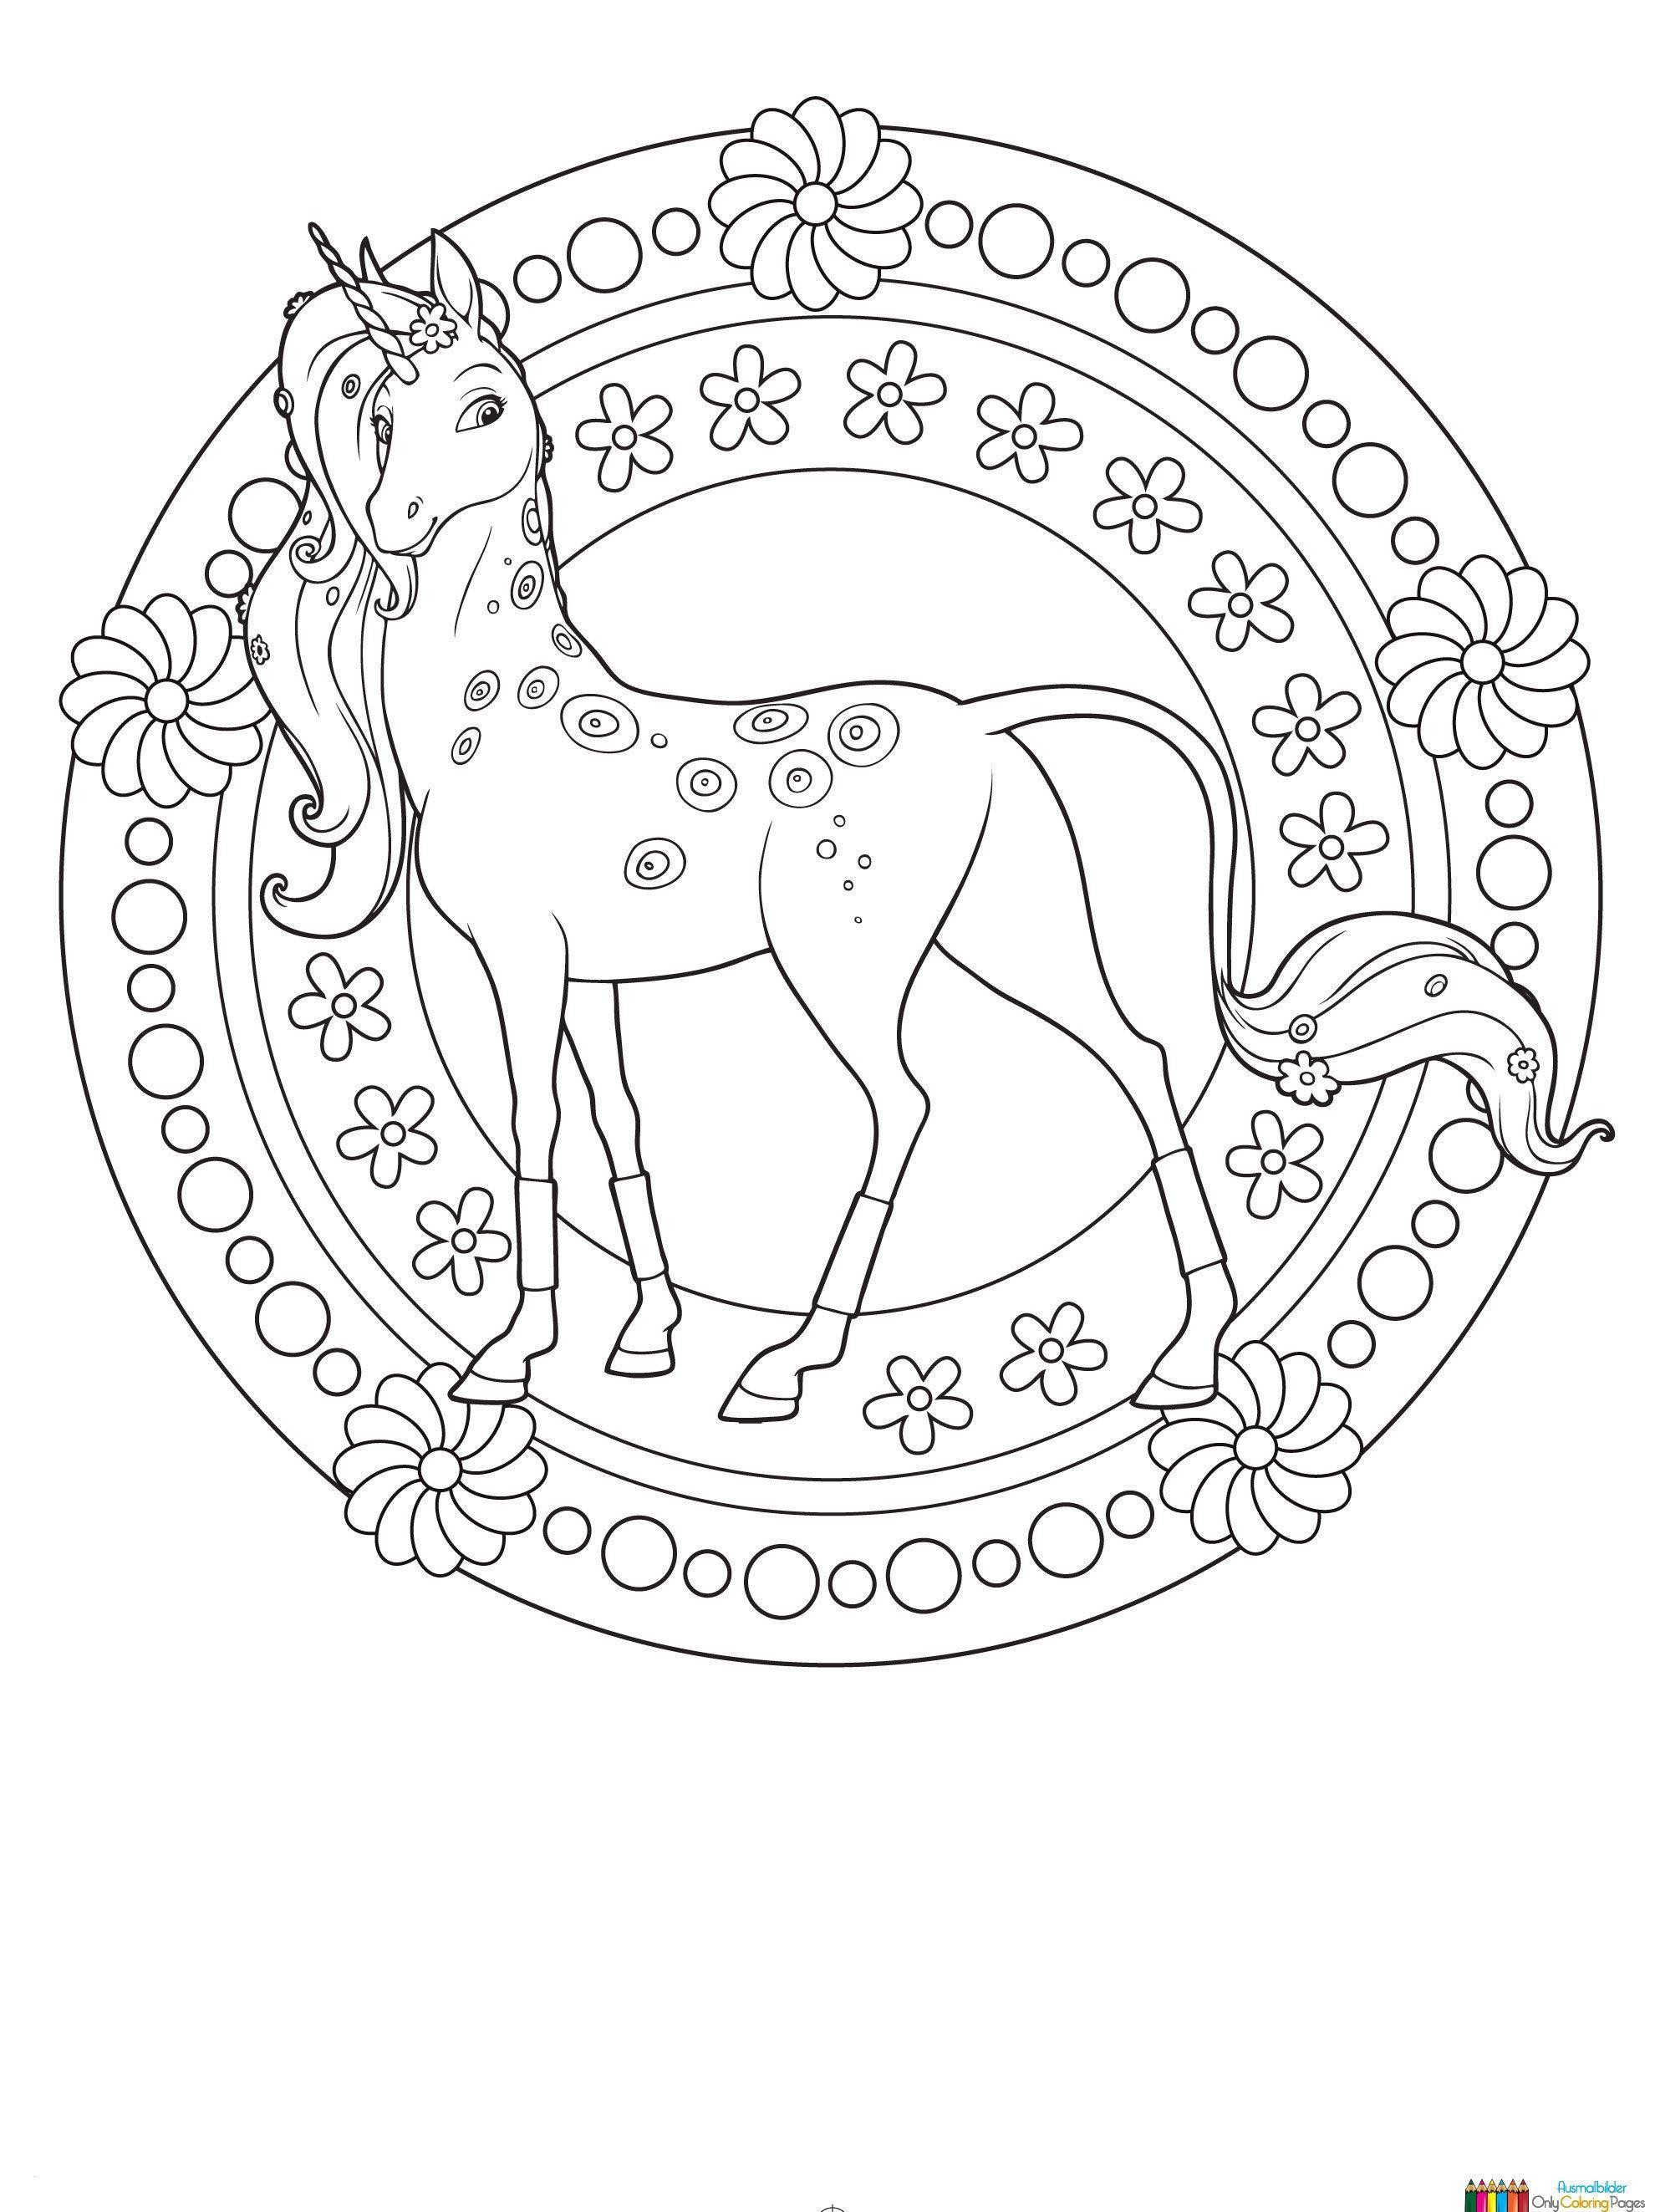 Hogwarts Wappen Zum Ausmalen Neu 37 Baum Ausmalbilder Scoredatscore Schön Harry Potter Hogwarts Bild